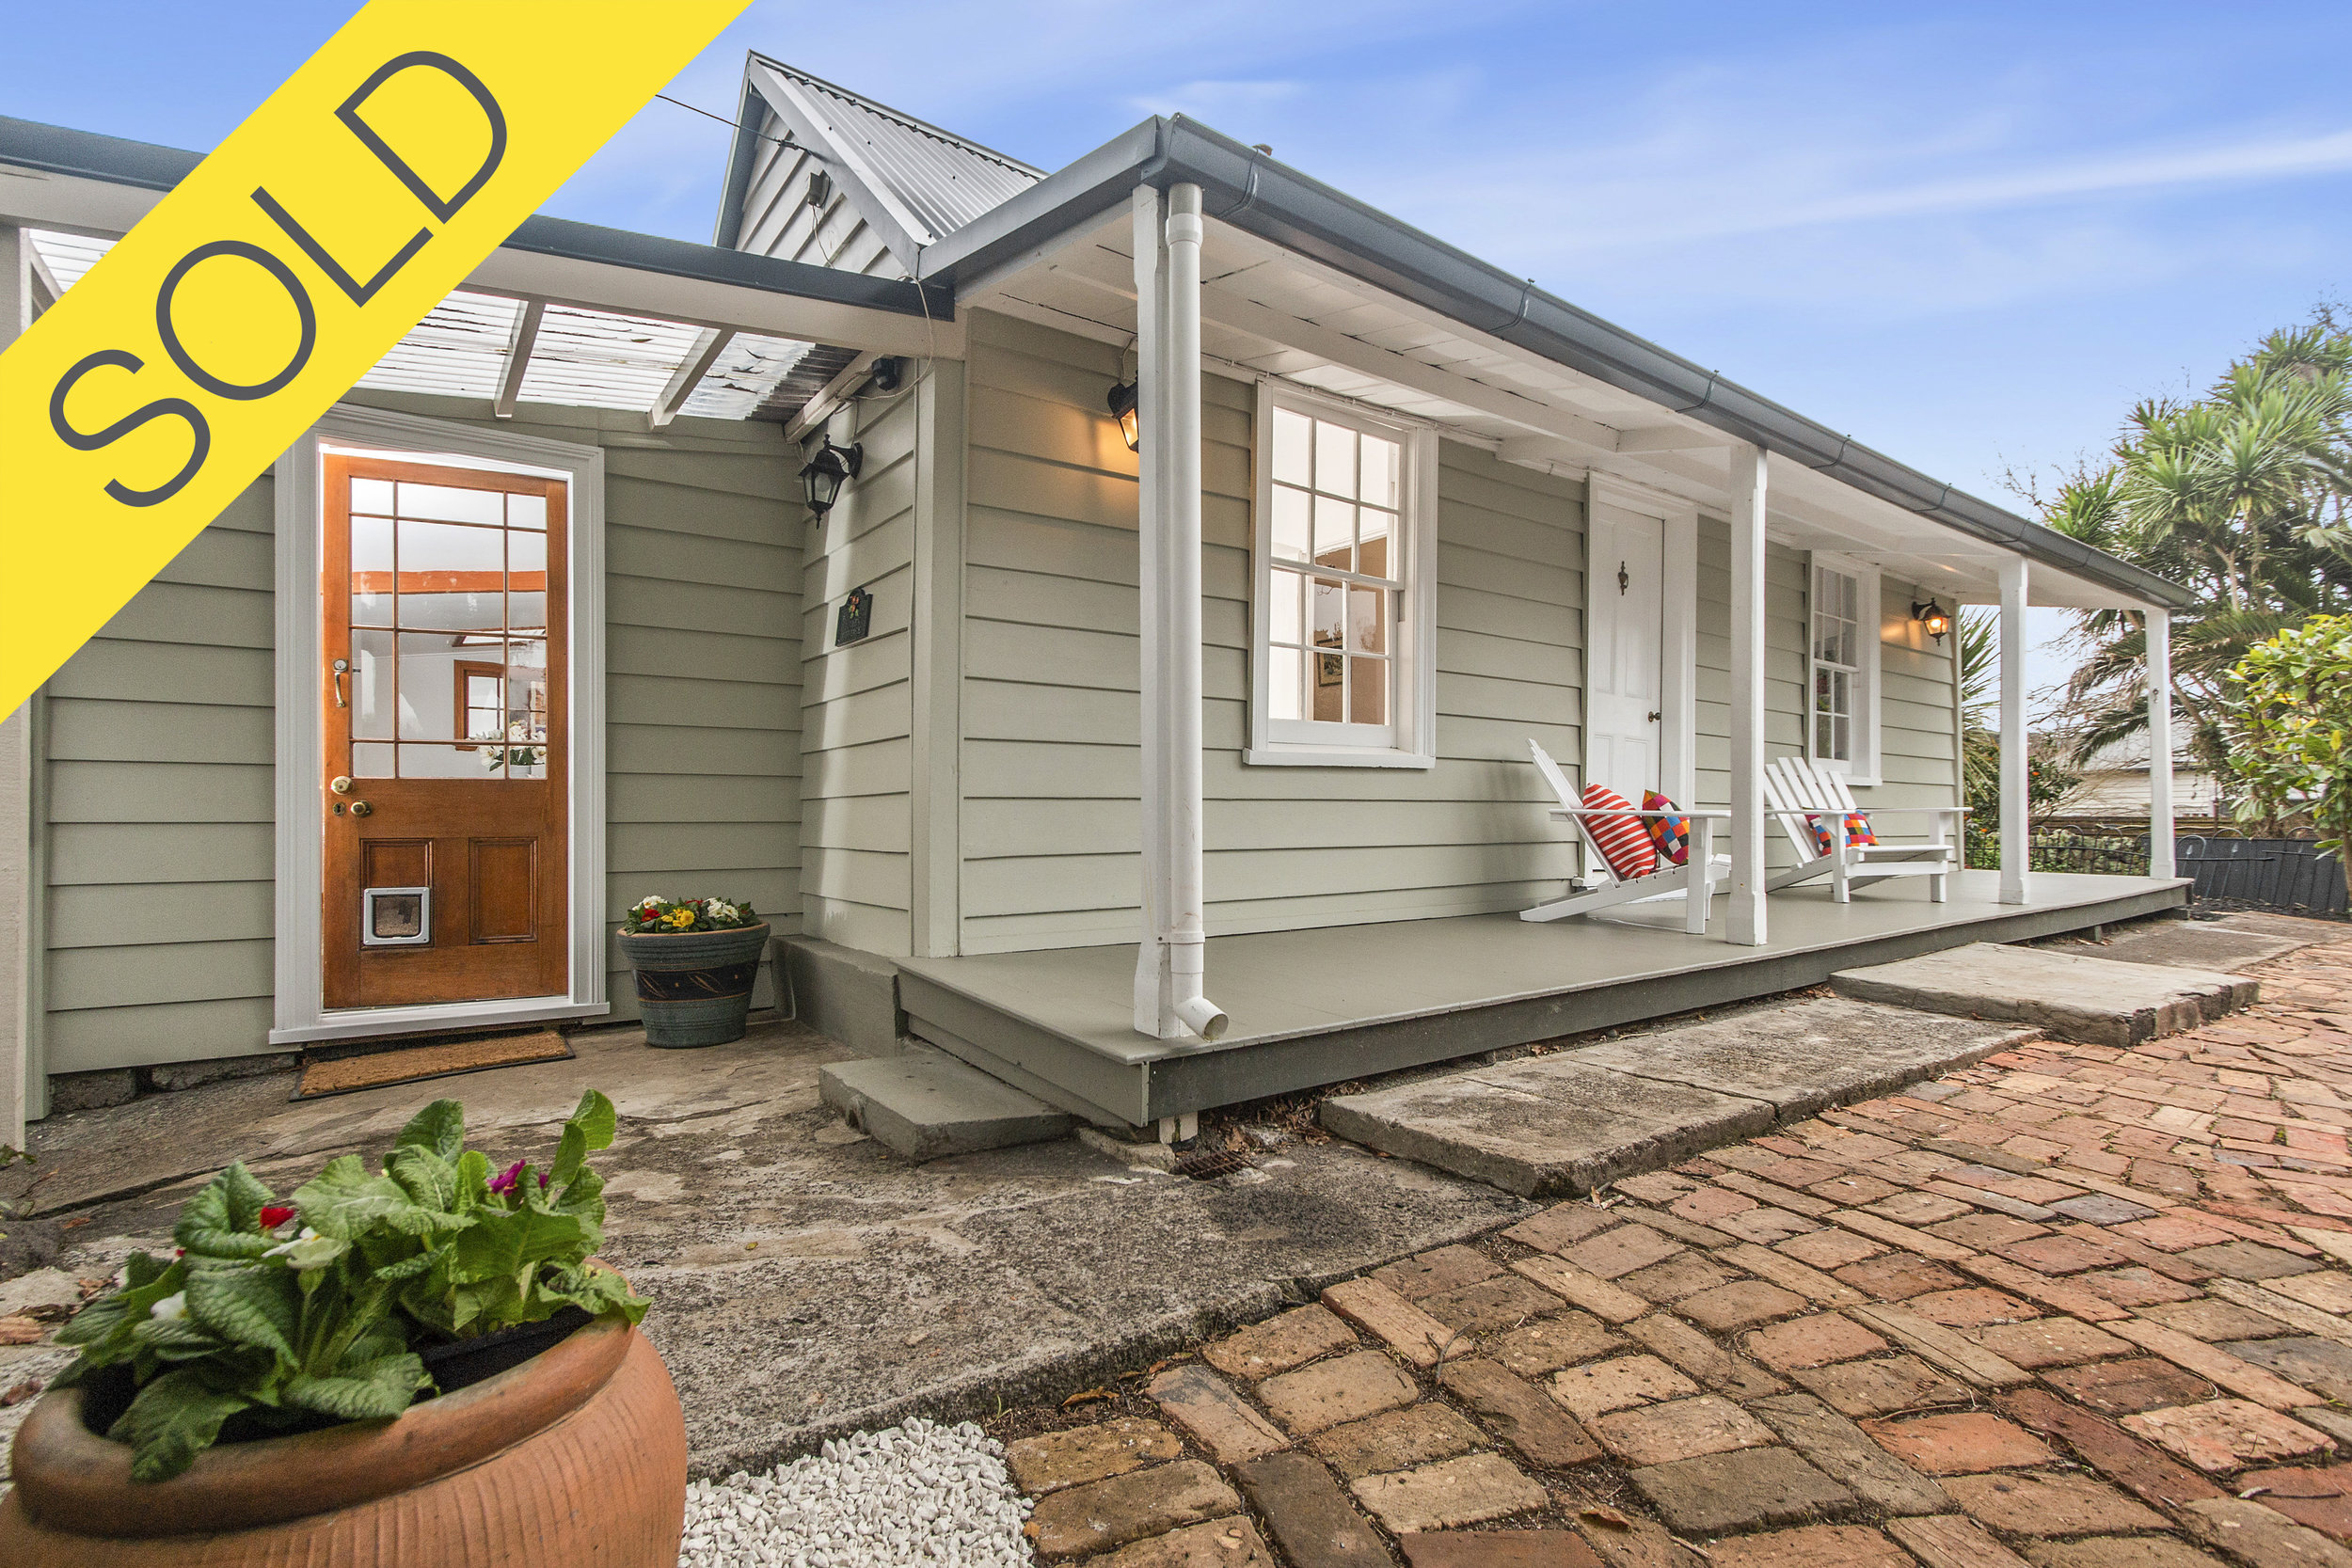 168 Grey Street, Onehunga, Auckland - SOLD SEPTEMBER 20183 Beds I 1 Bath I 4 Parking